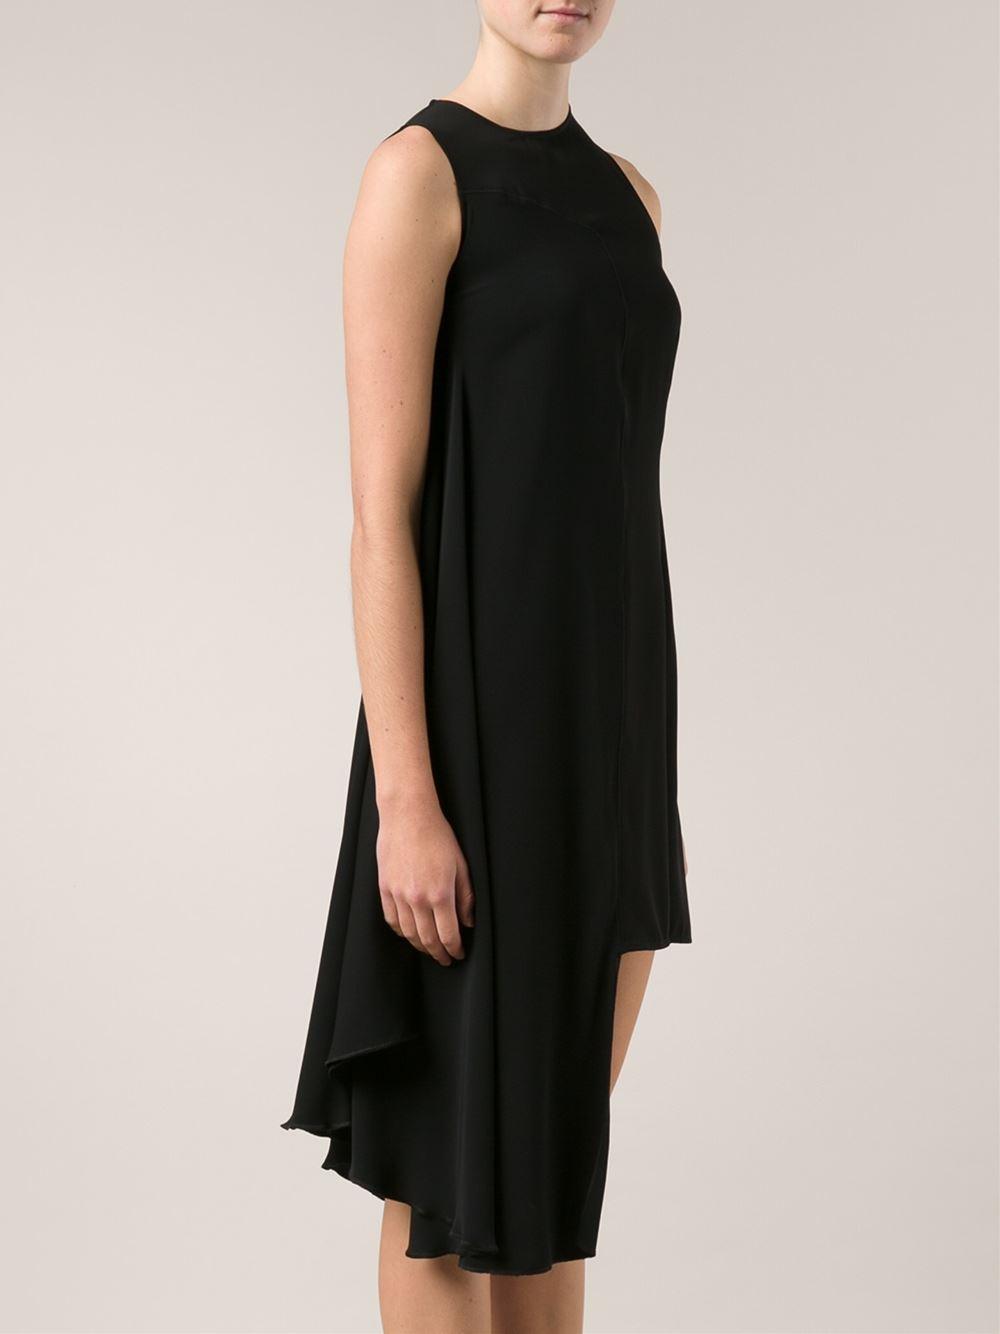 Black chiffon asymmetric dress Maison Martin Margiela Free Shipping 100% Authentic DRVjm